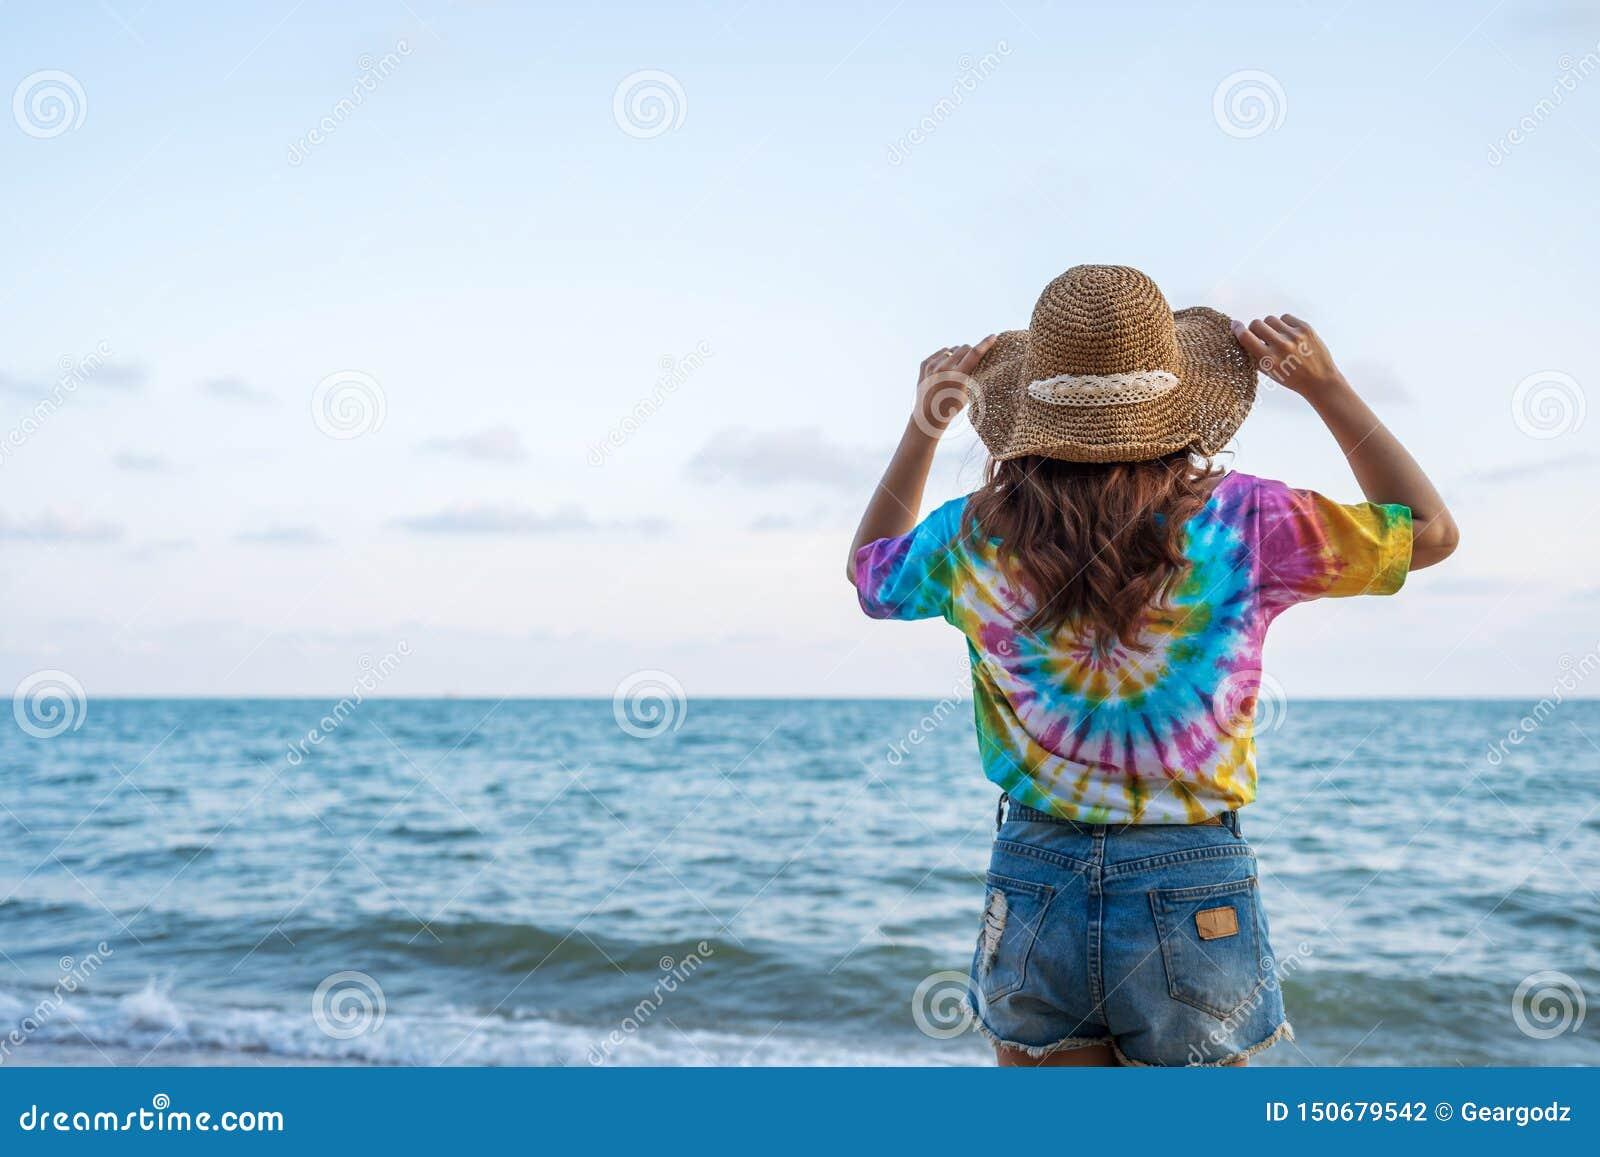 Woman wearing hat standing on sea beach